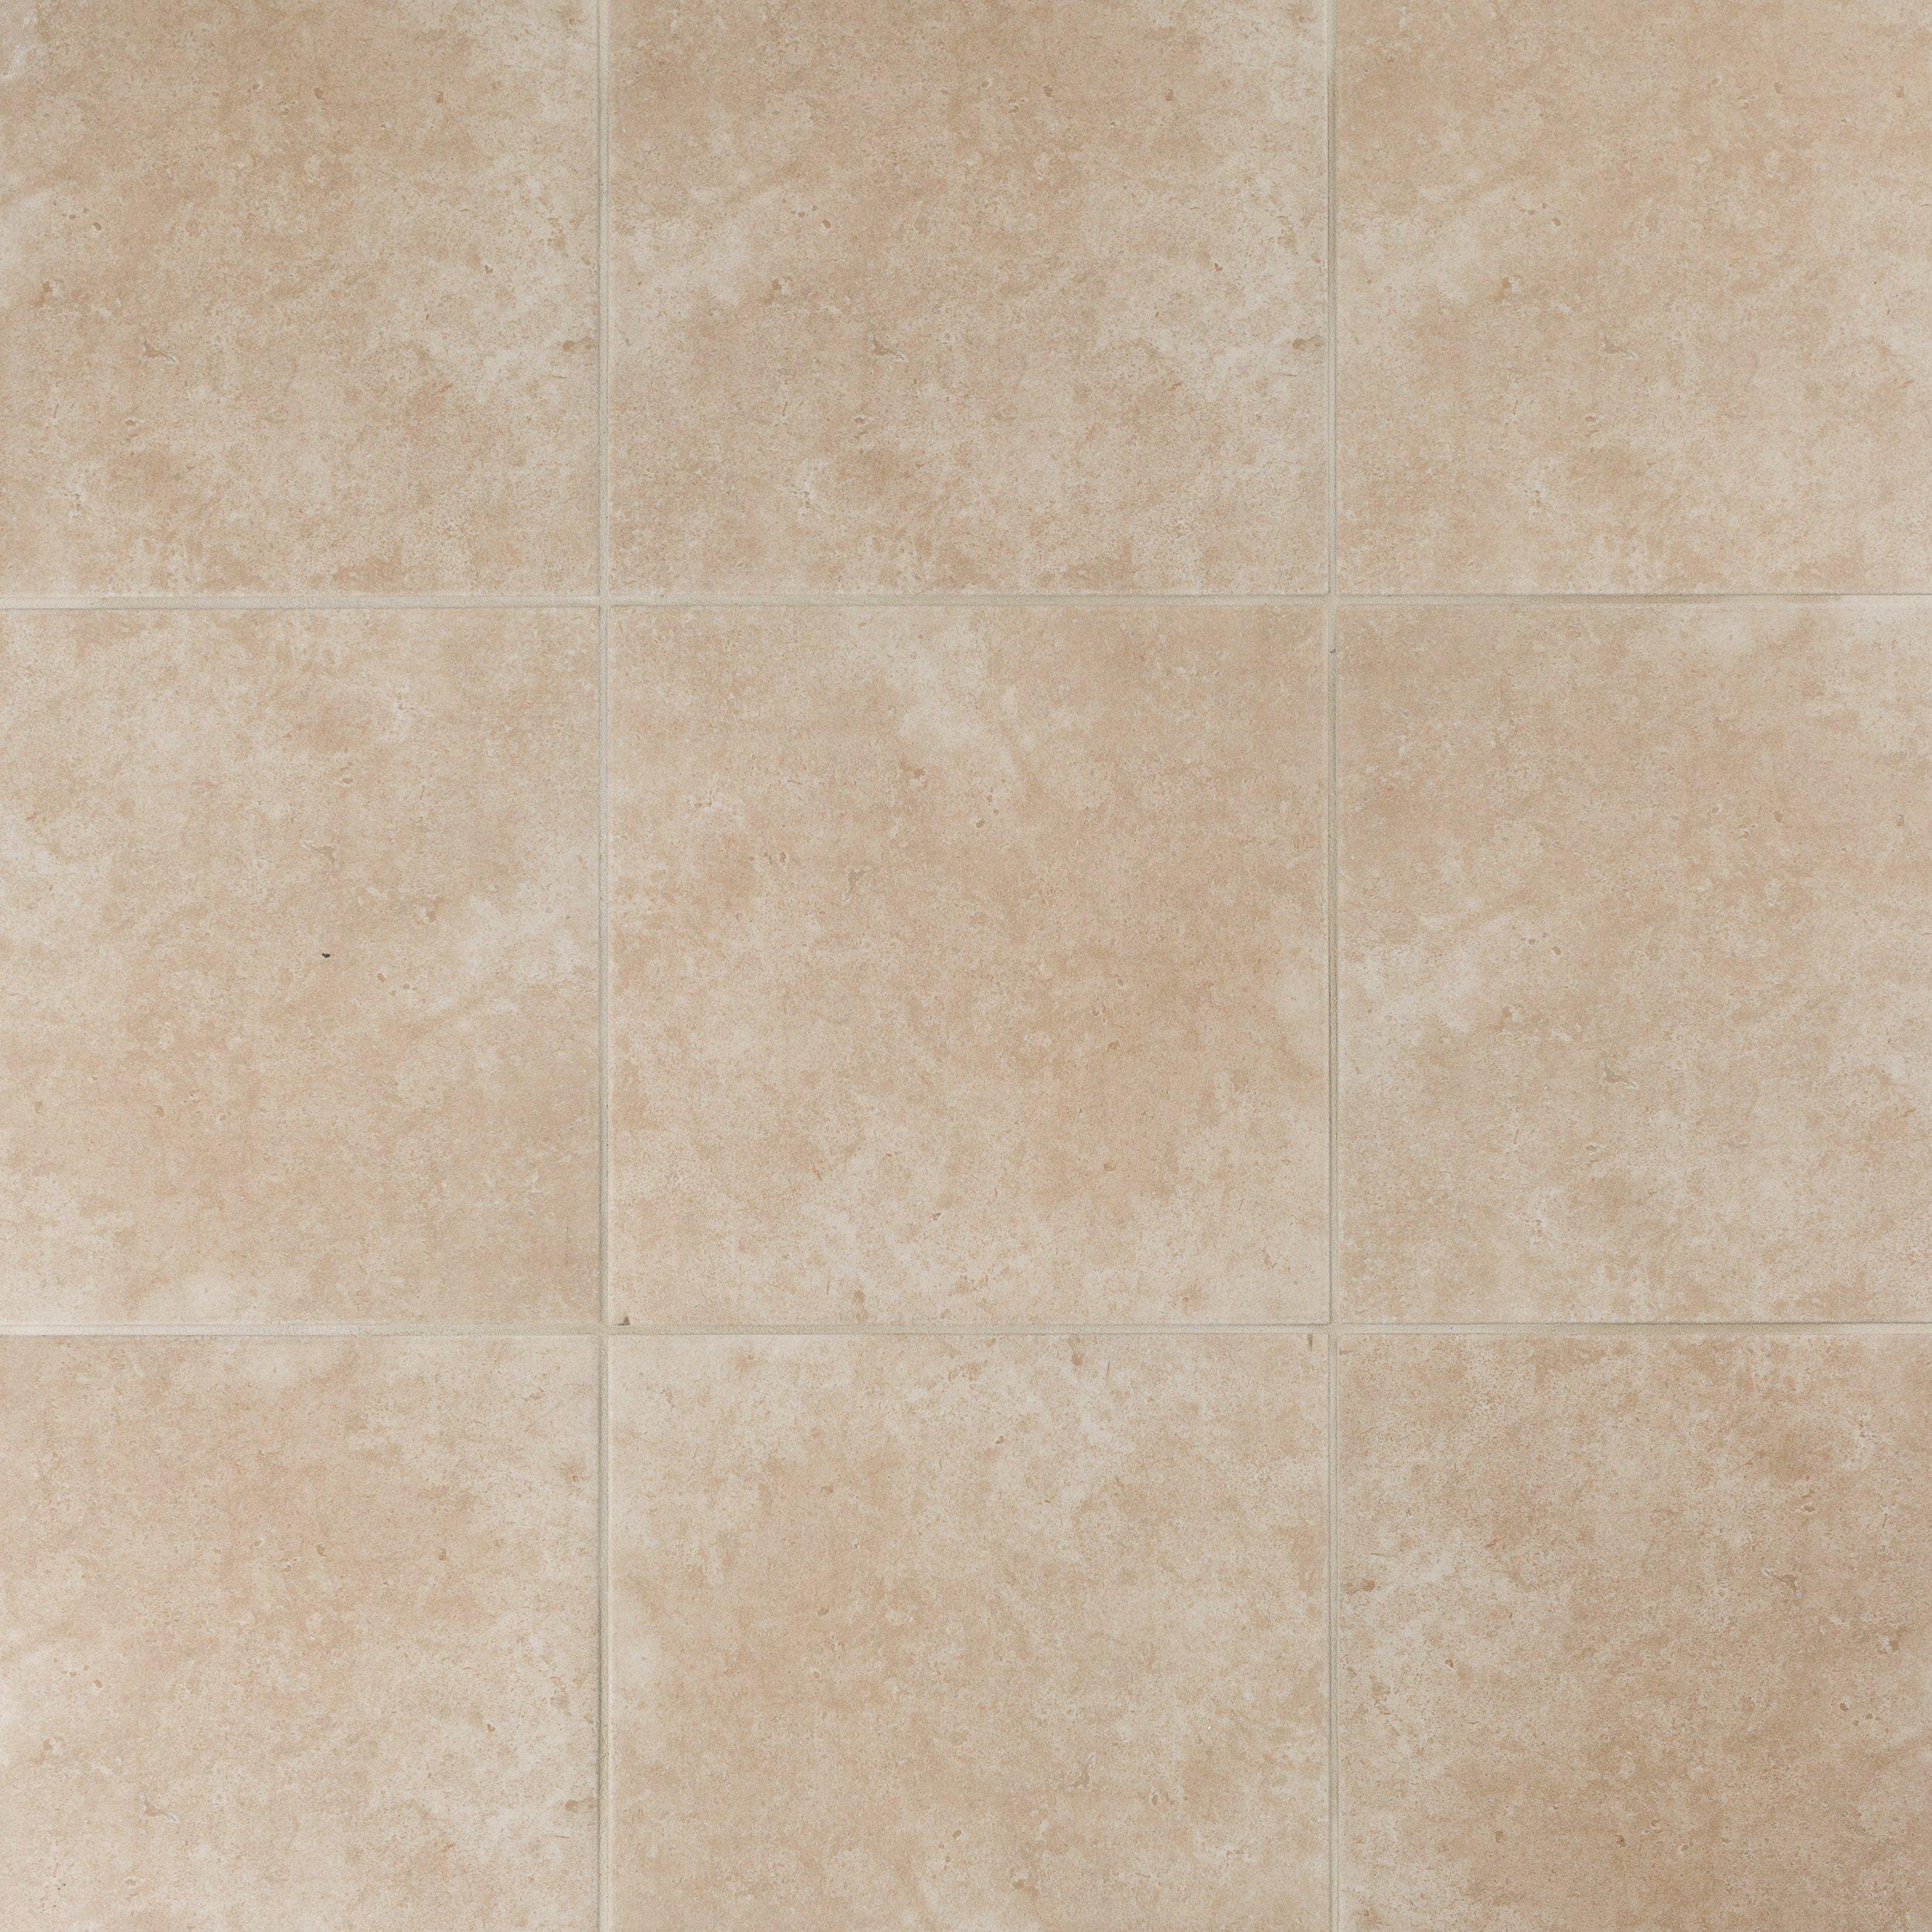 Dover Beige Porcelain Tile Tiles Stone Look